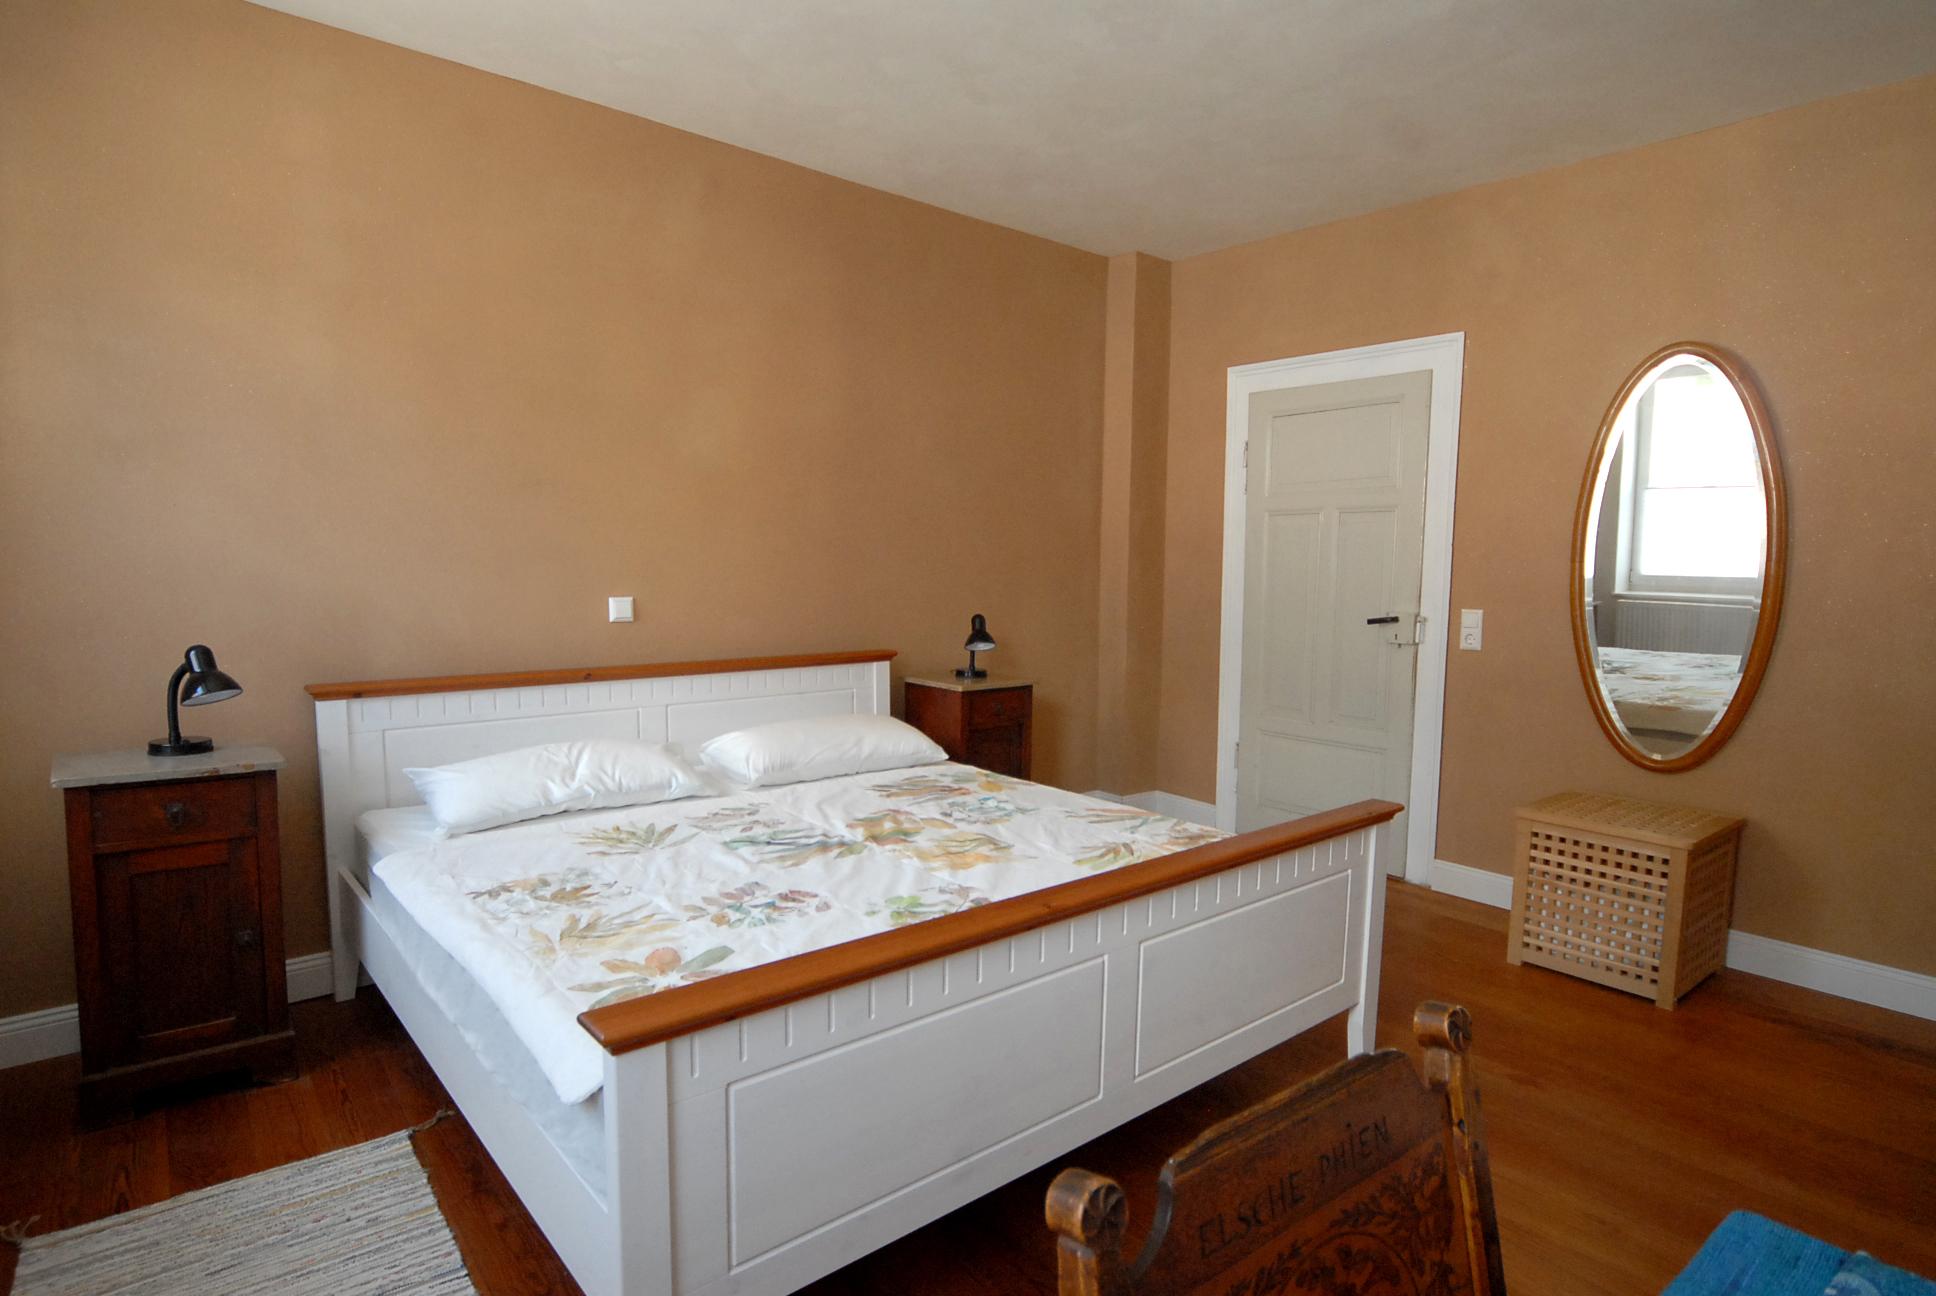 Doppelbett 180 cm breit